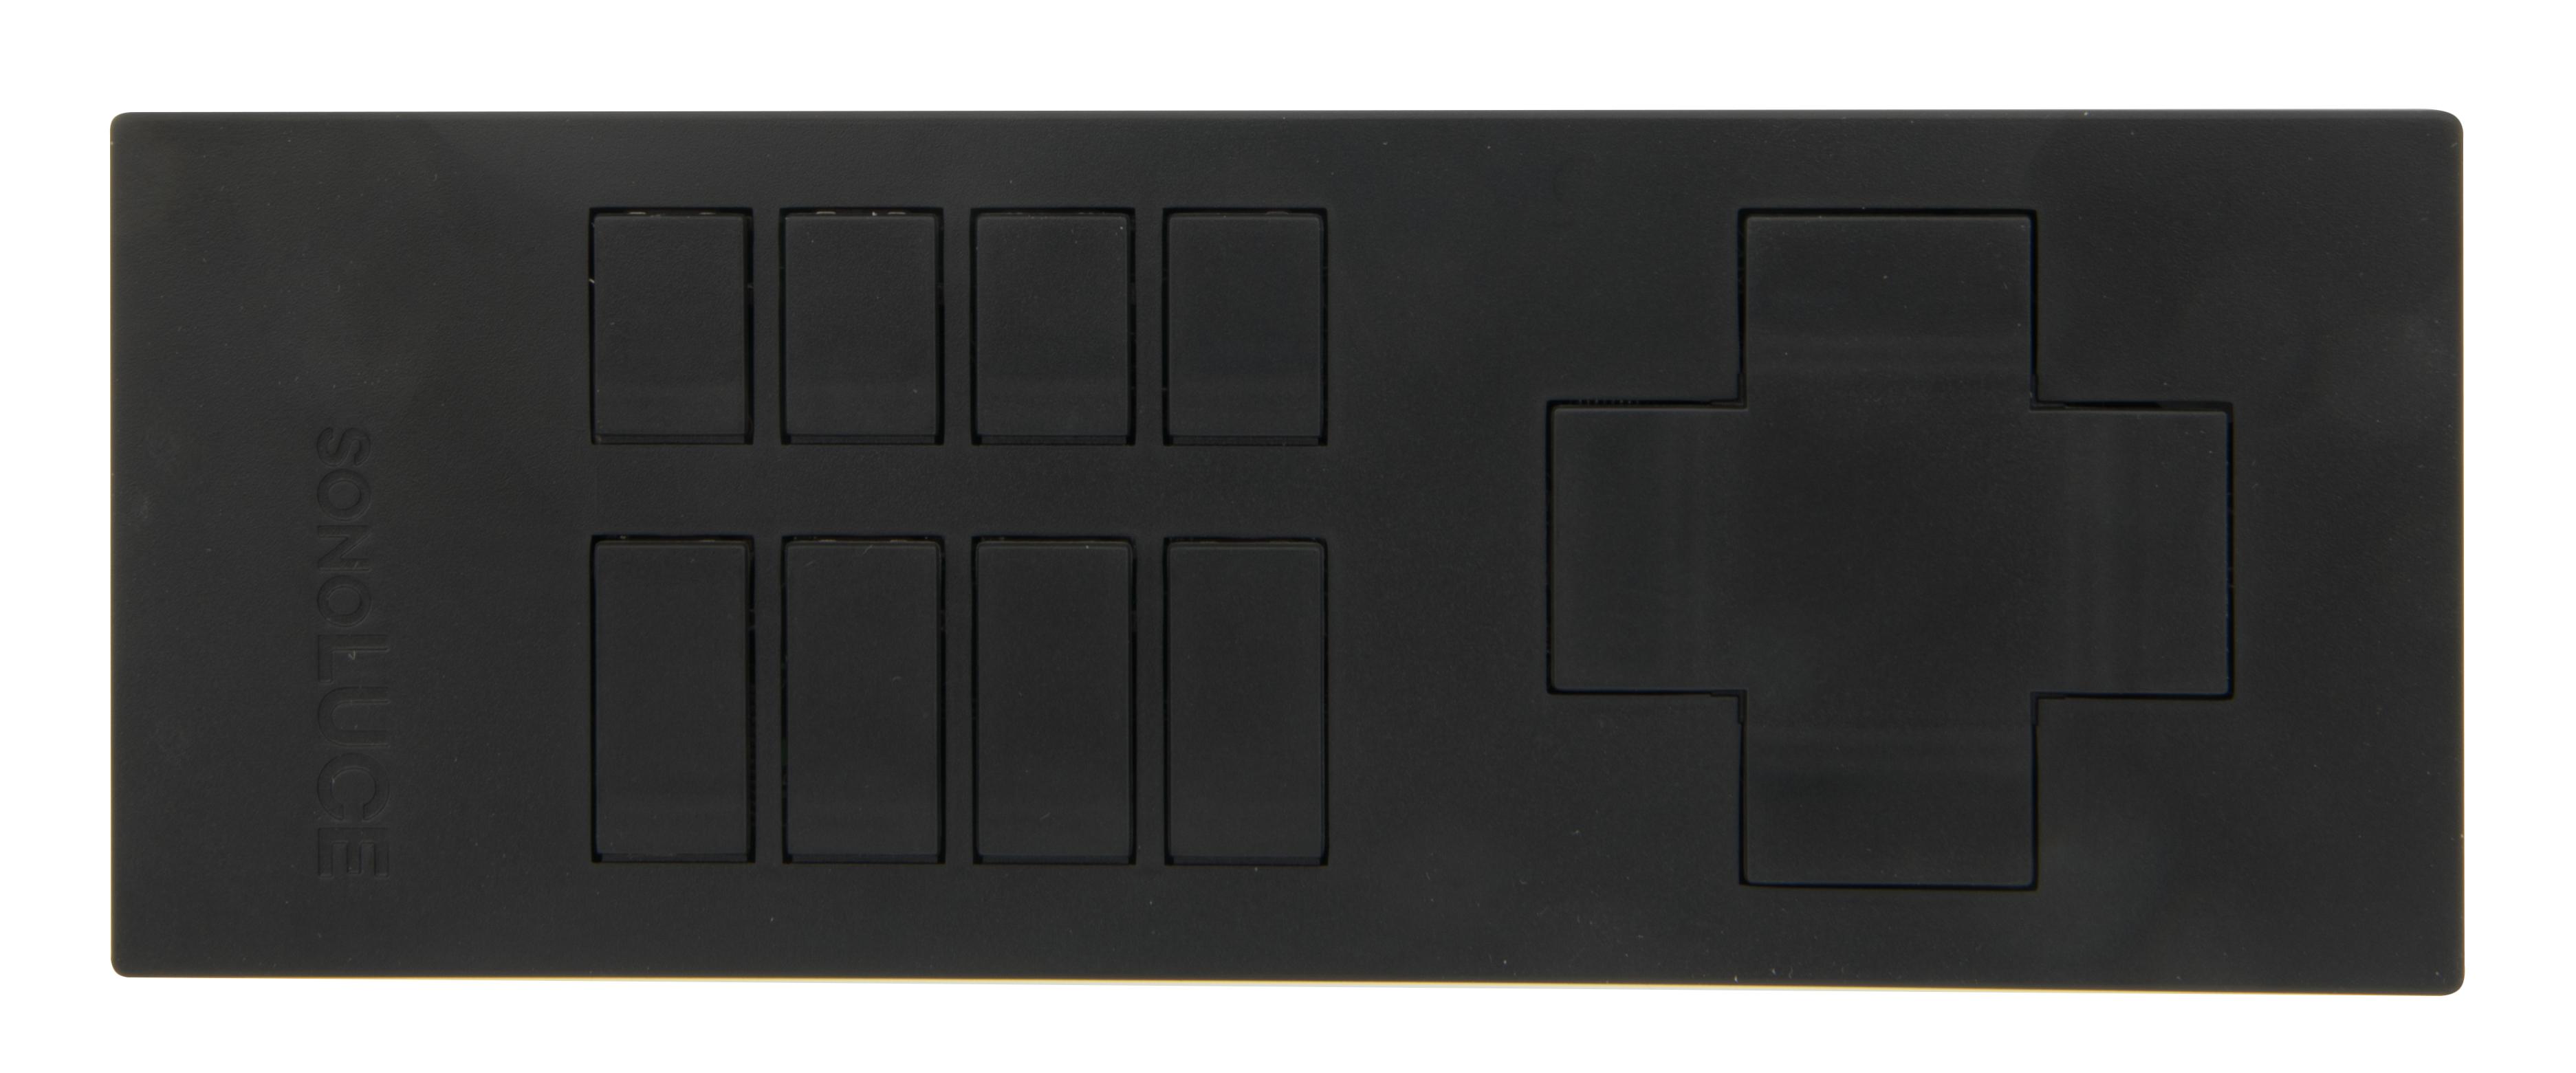 1 Stk wDALI Transceiver + Fernbedienung LILC004303